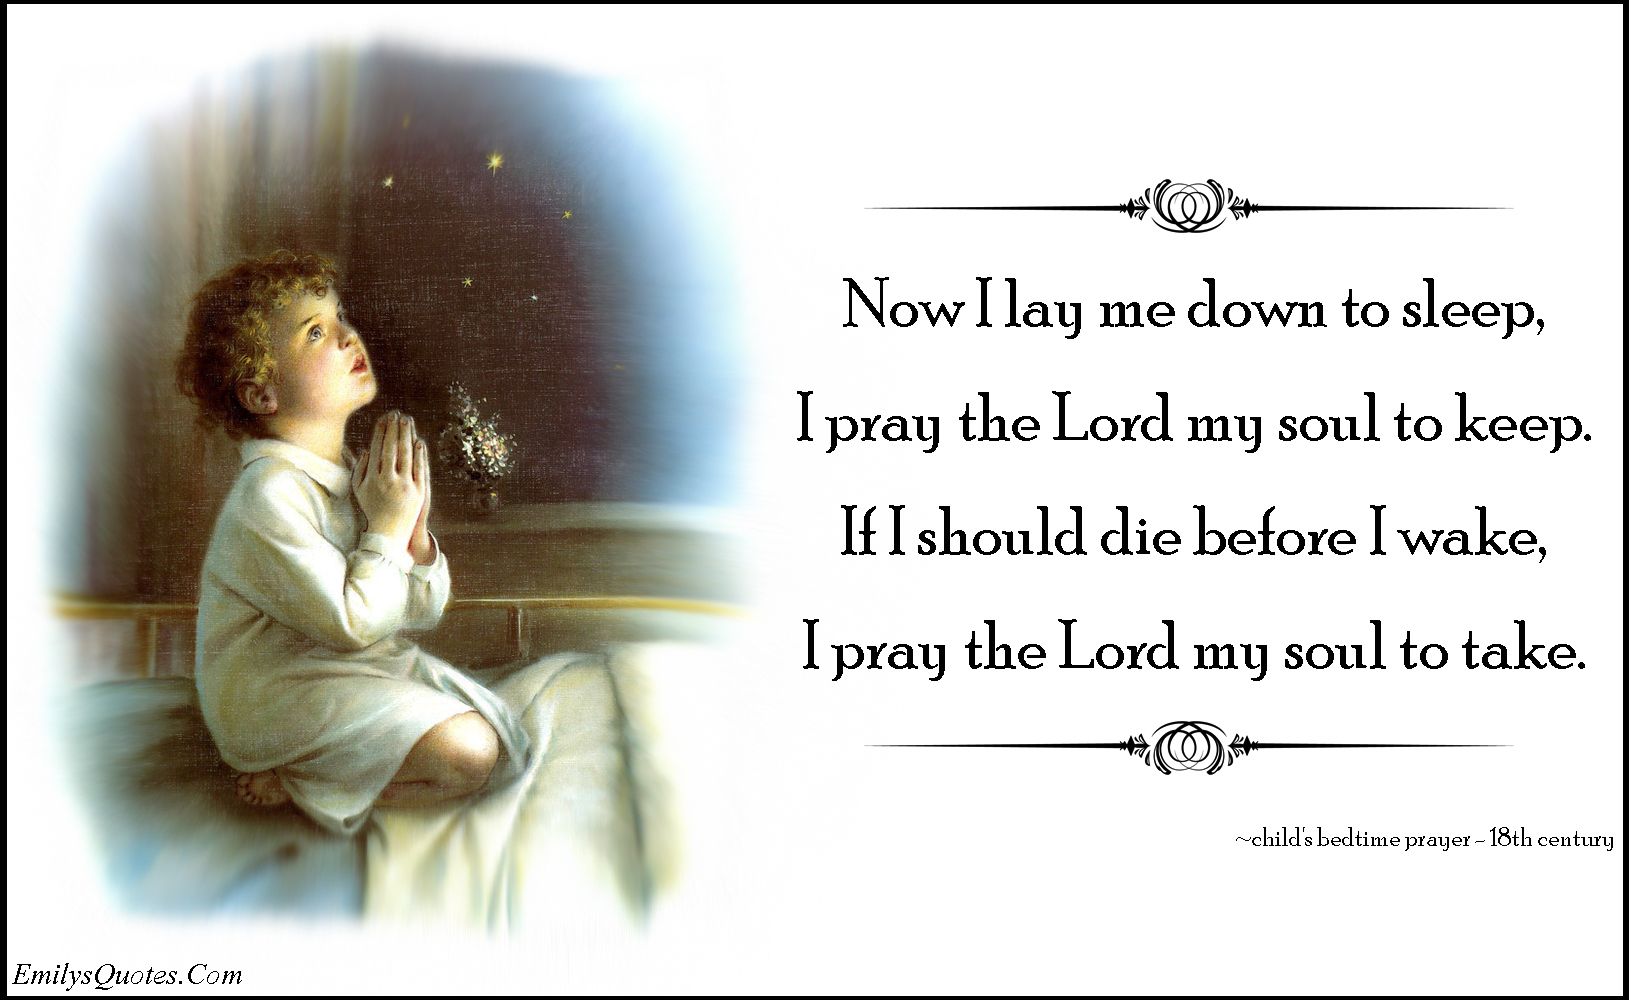 EmilysQuotes.Com - inspirational, poem, positive, pray, god, faith, Bible Verses, soul, caring